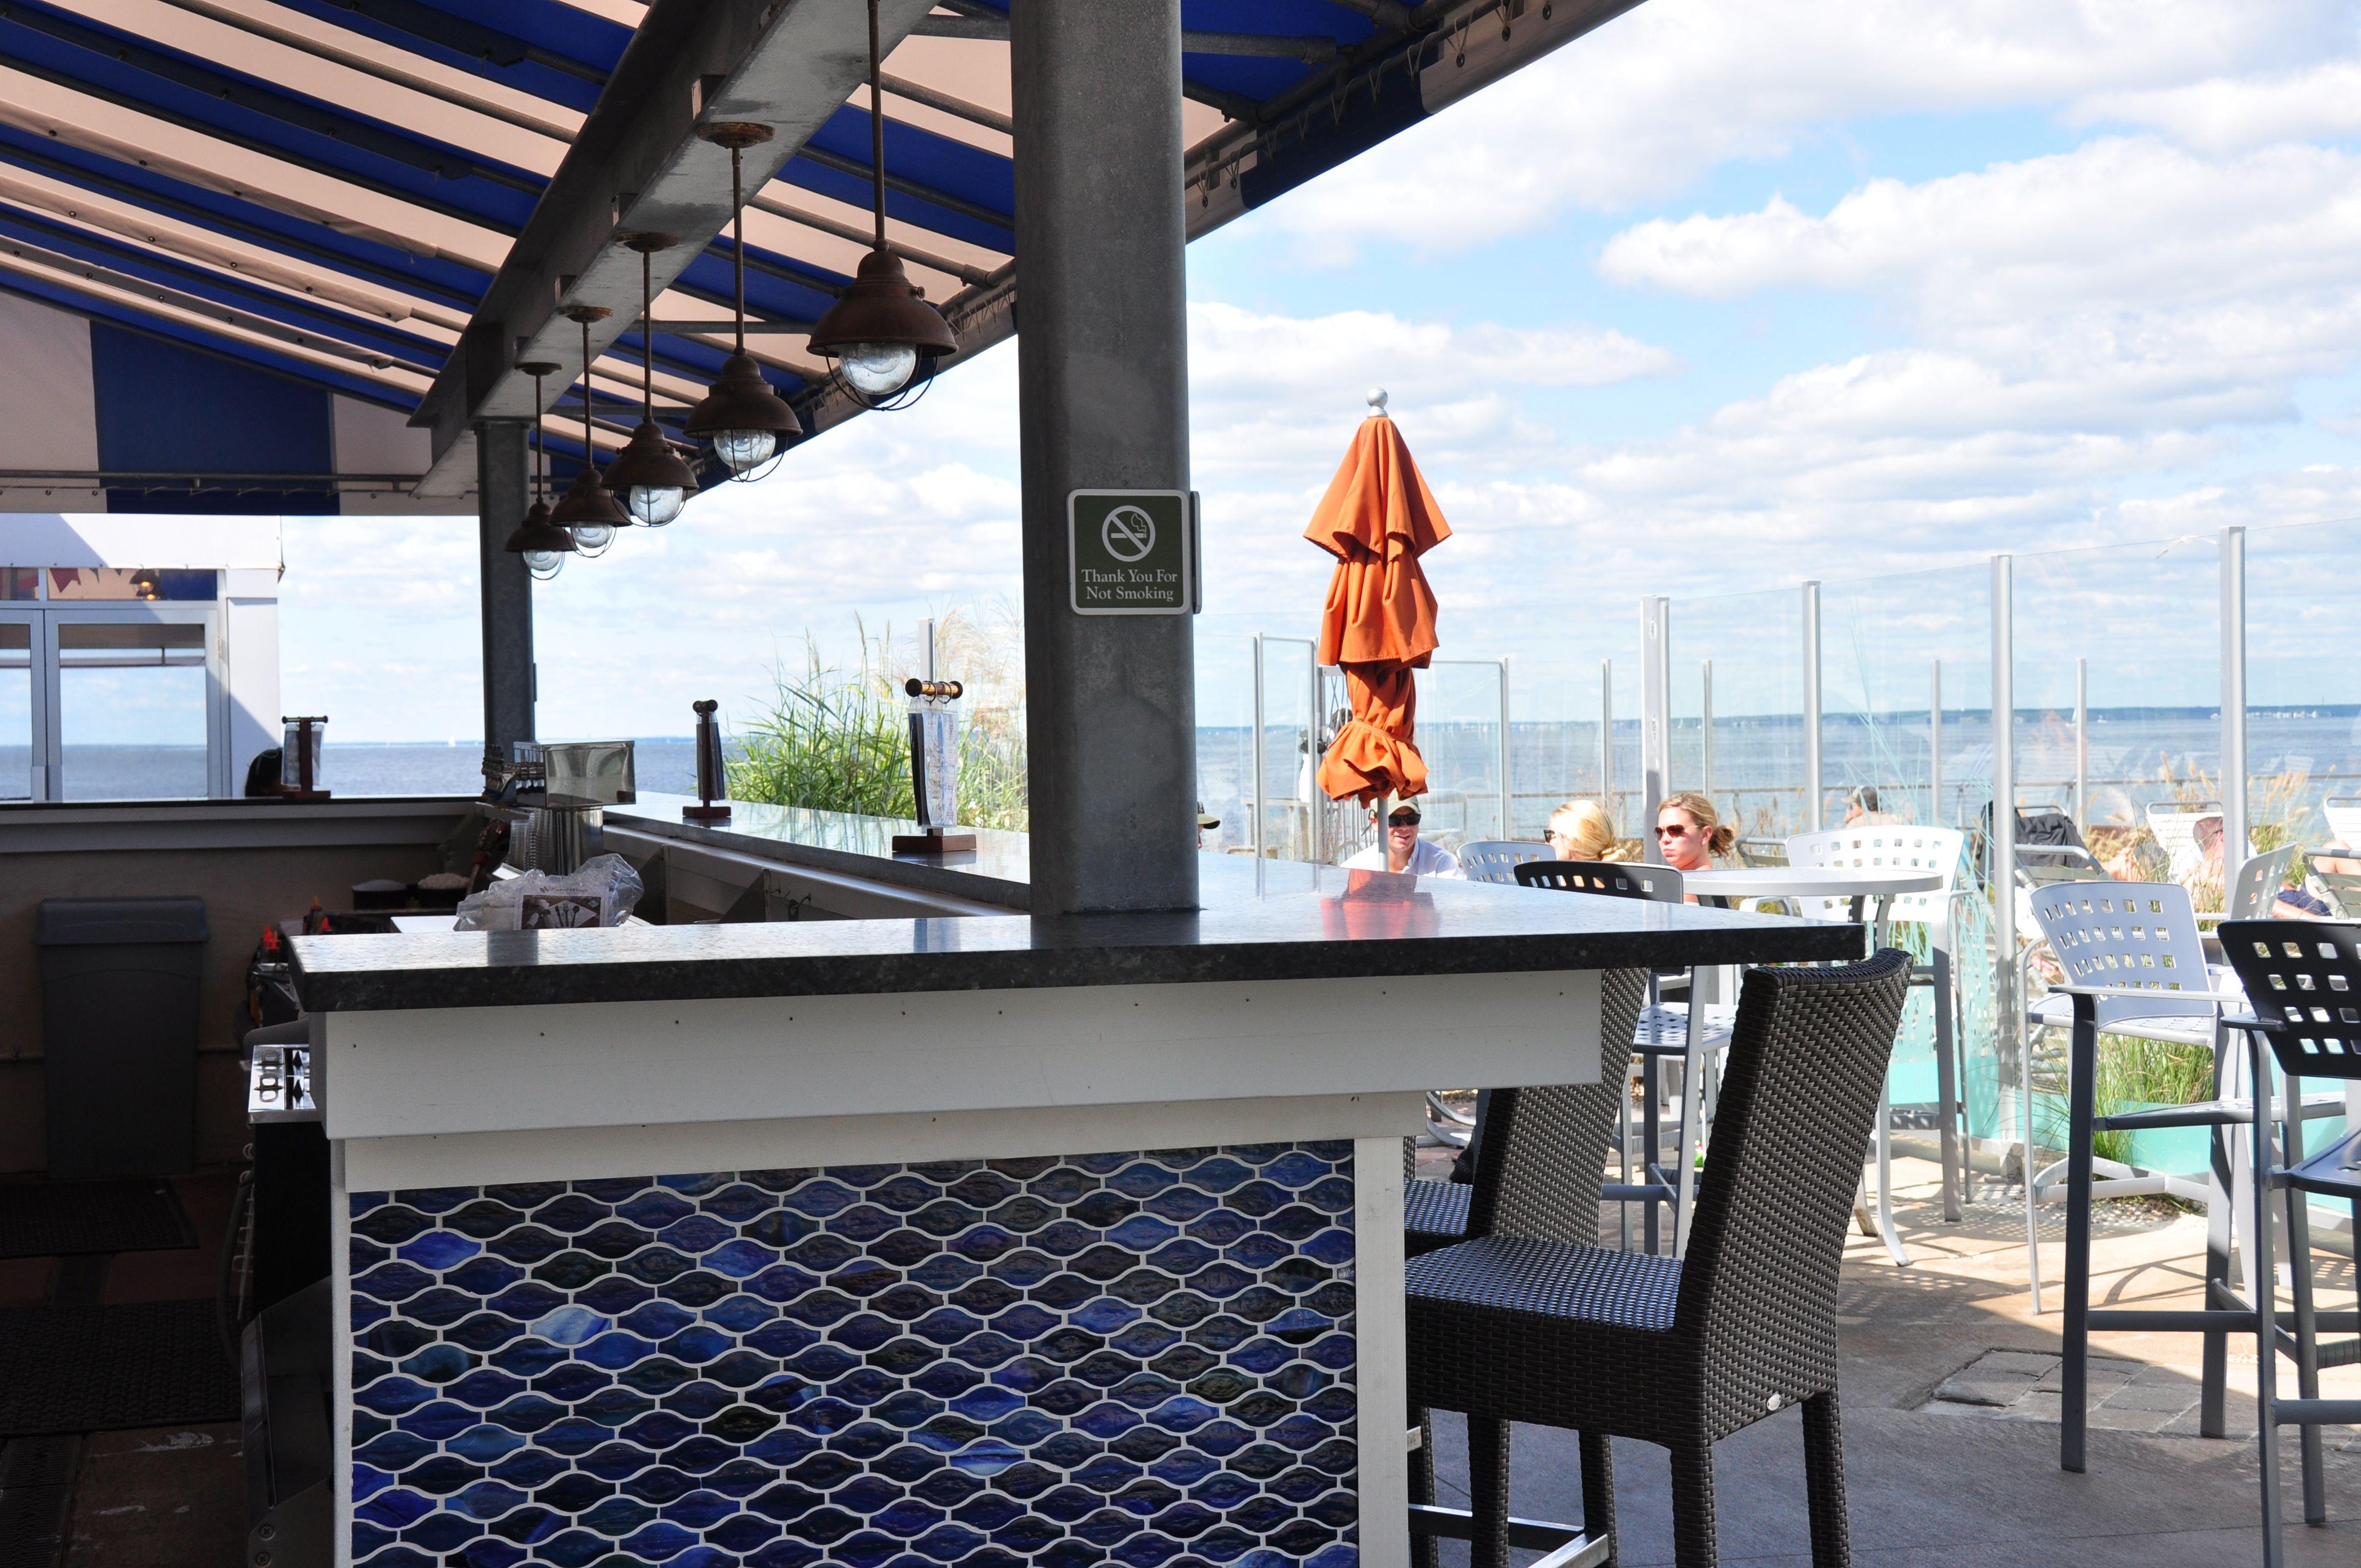 hotel outdoor bars google search bar patio pinterest